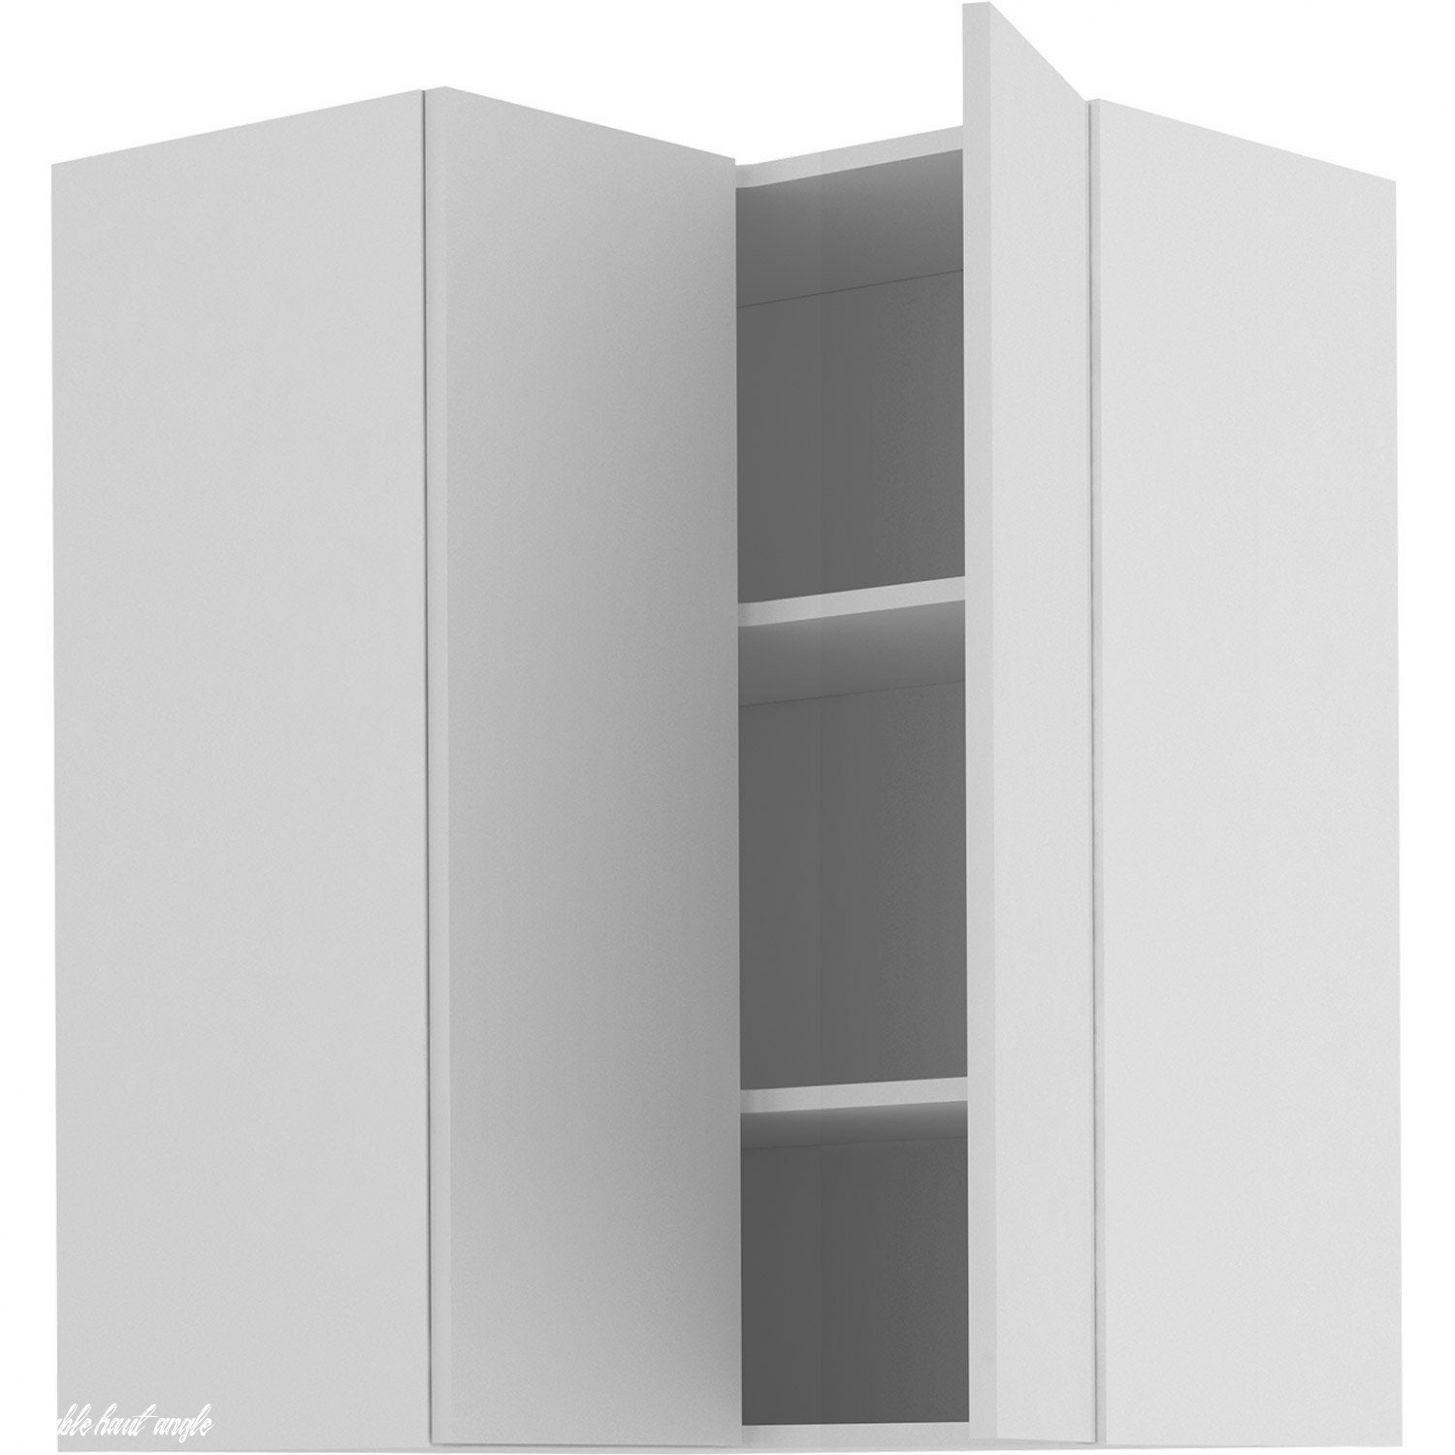 7 Meuble Haut Angle in 2020 Locker storage, Storage